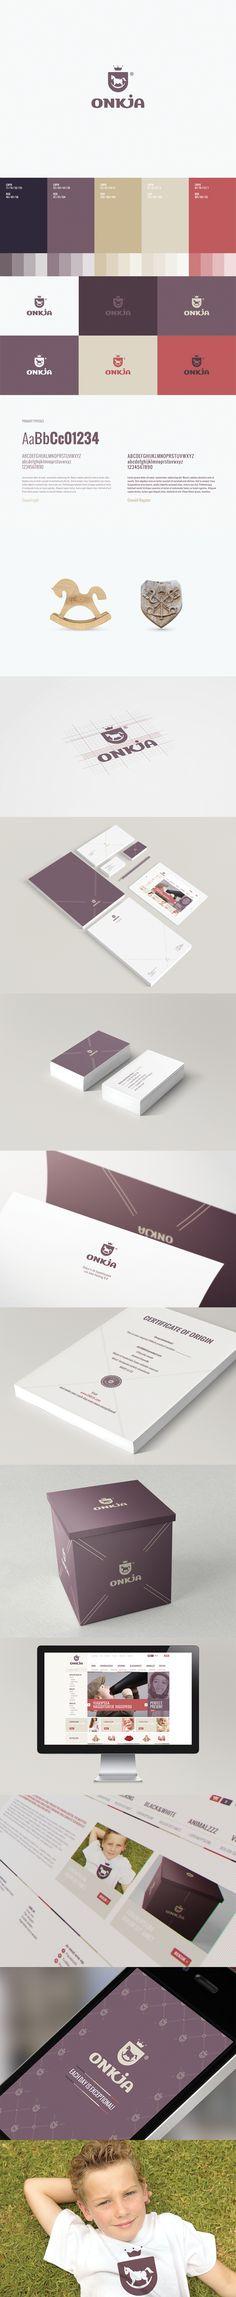 Onkja| #stationary #corporate #design #corporatedesign #logo #identity #branding #marketing < repinned by www.BlickeDeeler.de